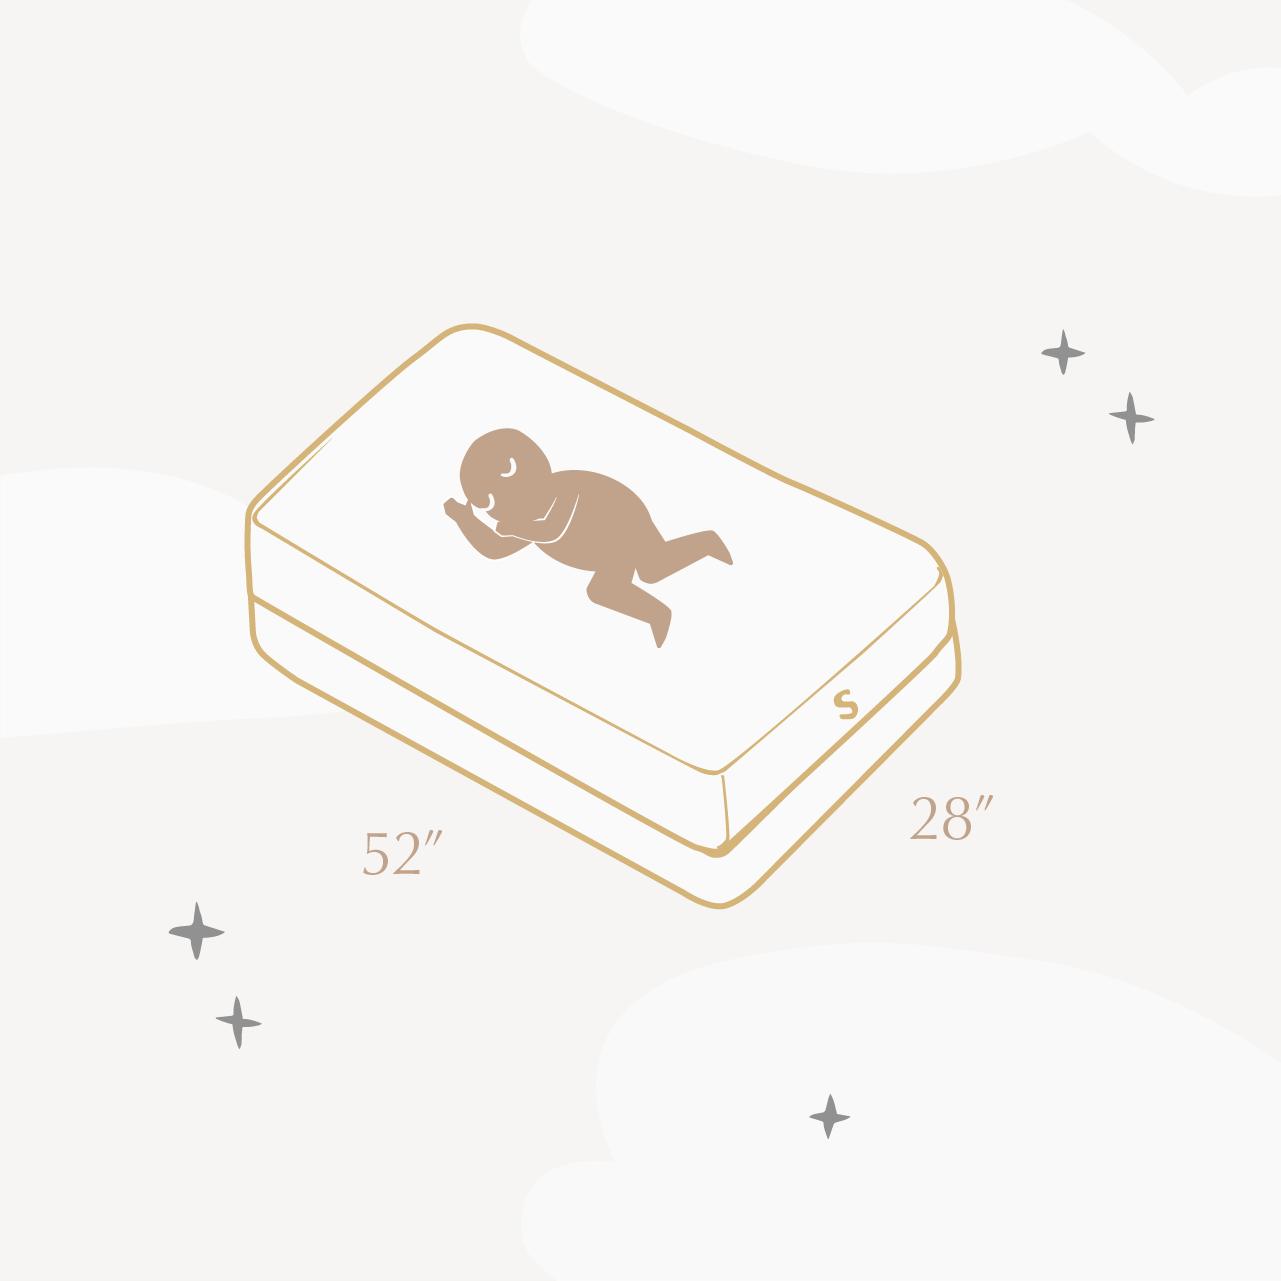 illustration showing crib mattress dimensions